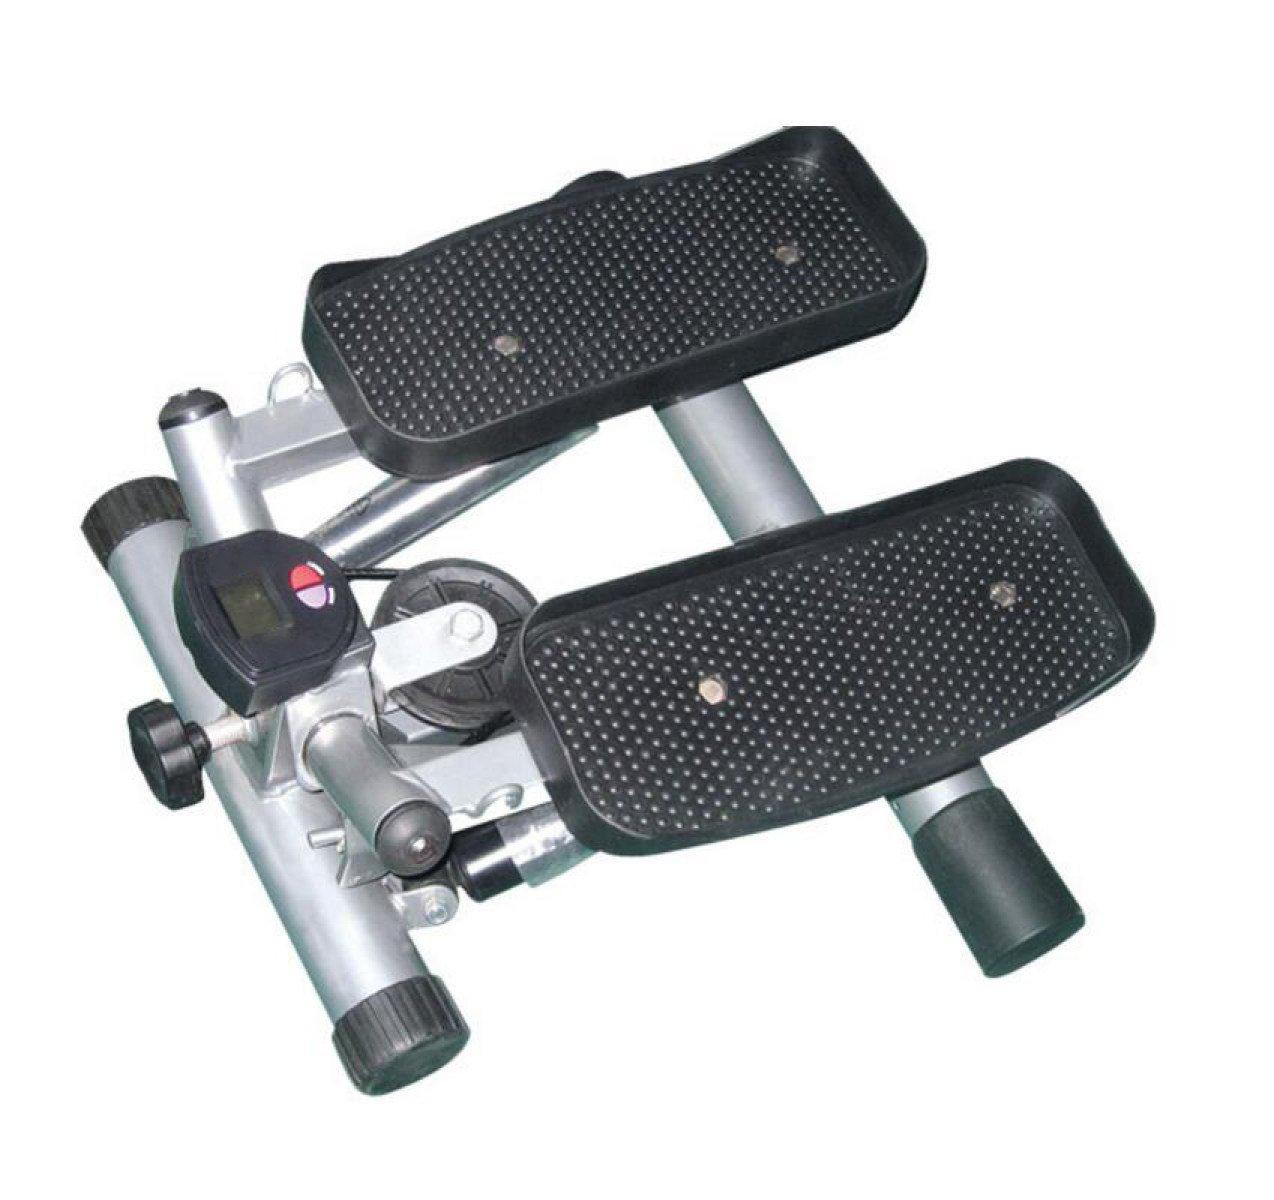 Swing Stepper Mute Roller Skate Machine Stomach Machine Home Sport Fitness Body Machine Aerobic Exercise by GHGJU